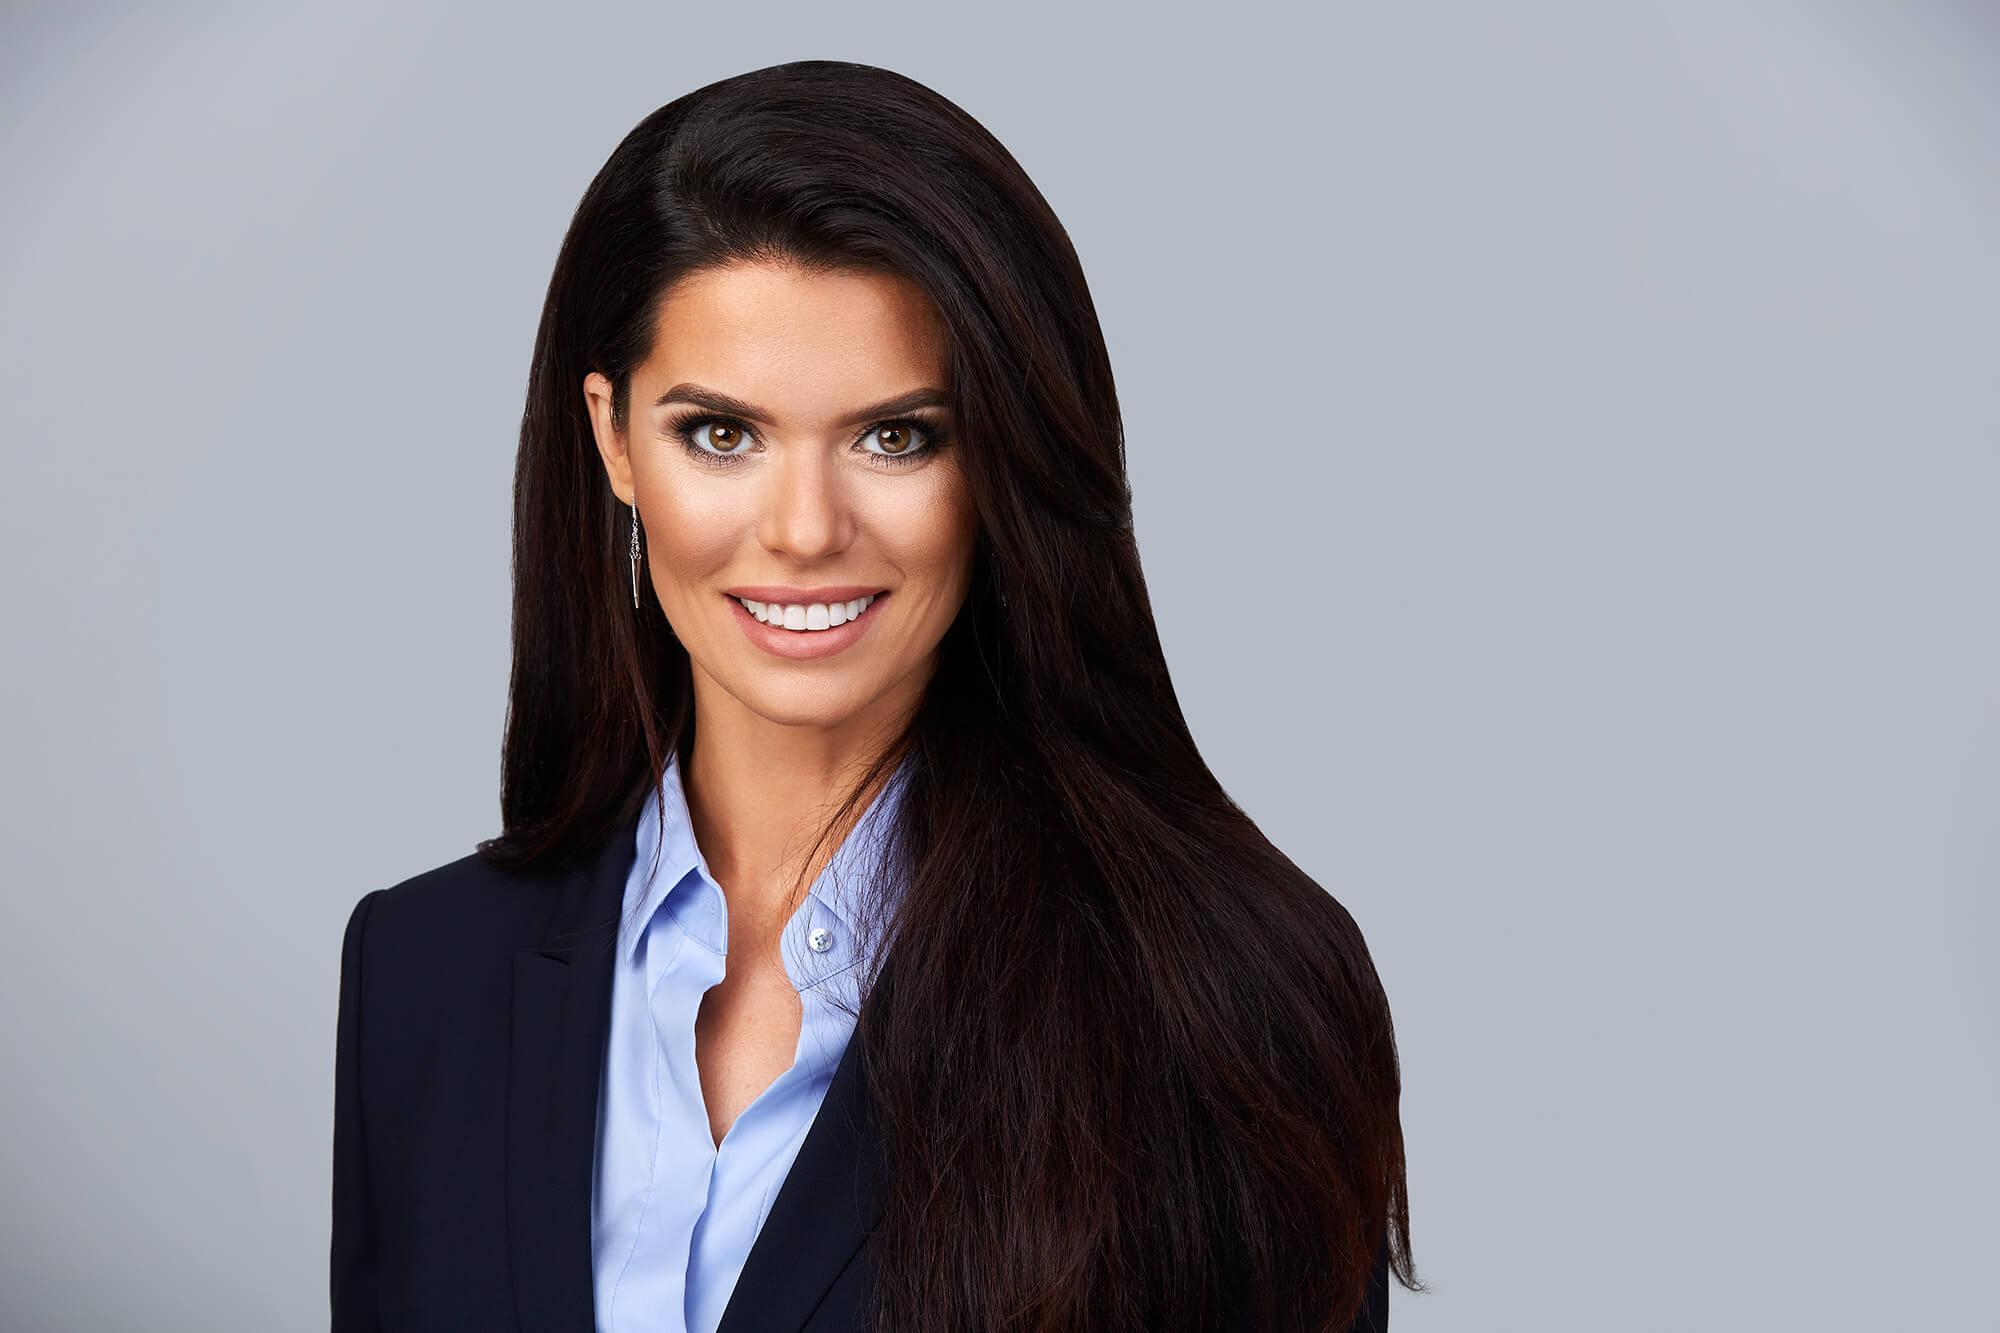 Sesja biznesowa kobieca